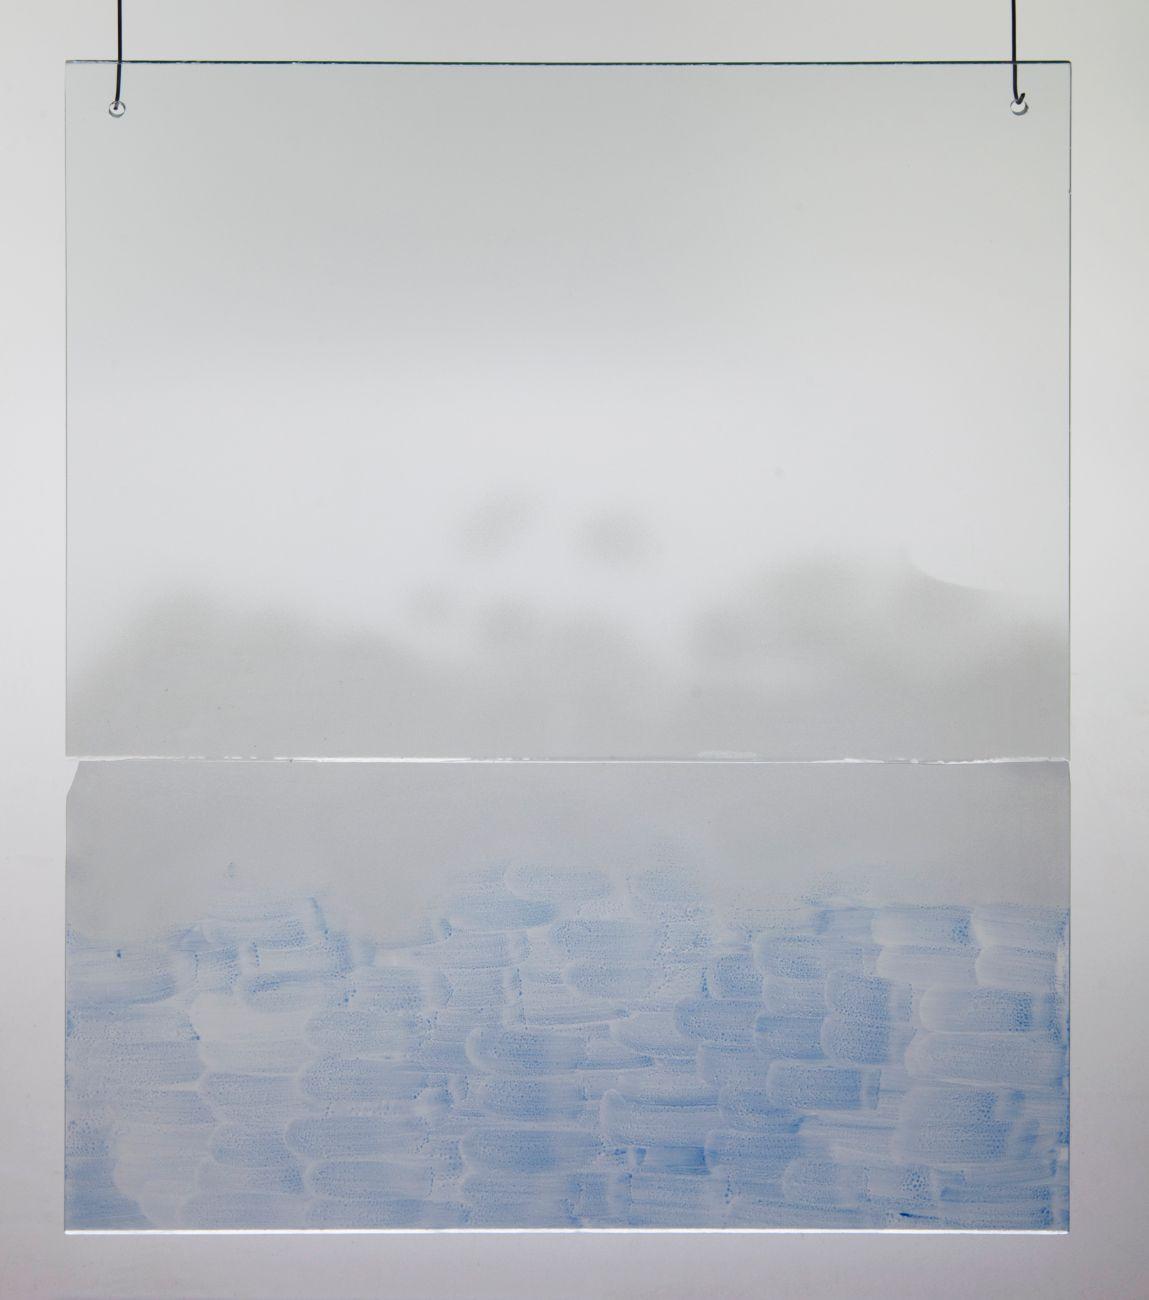 7, 40x50cm, maľba na skle, 2018